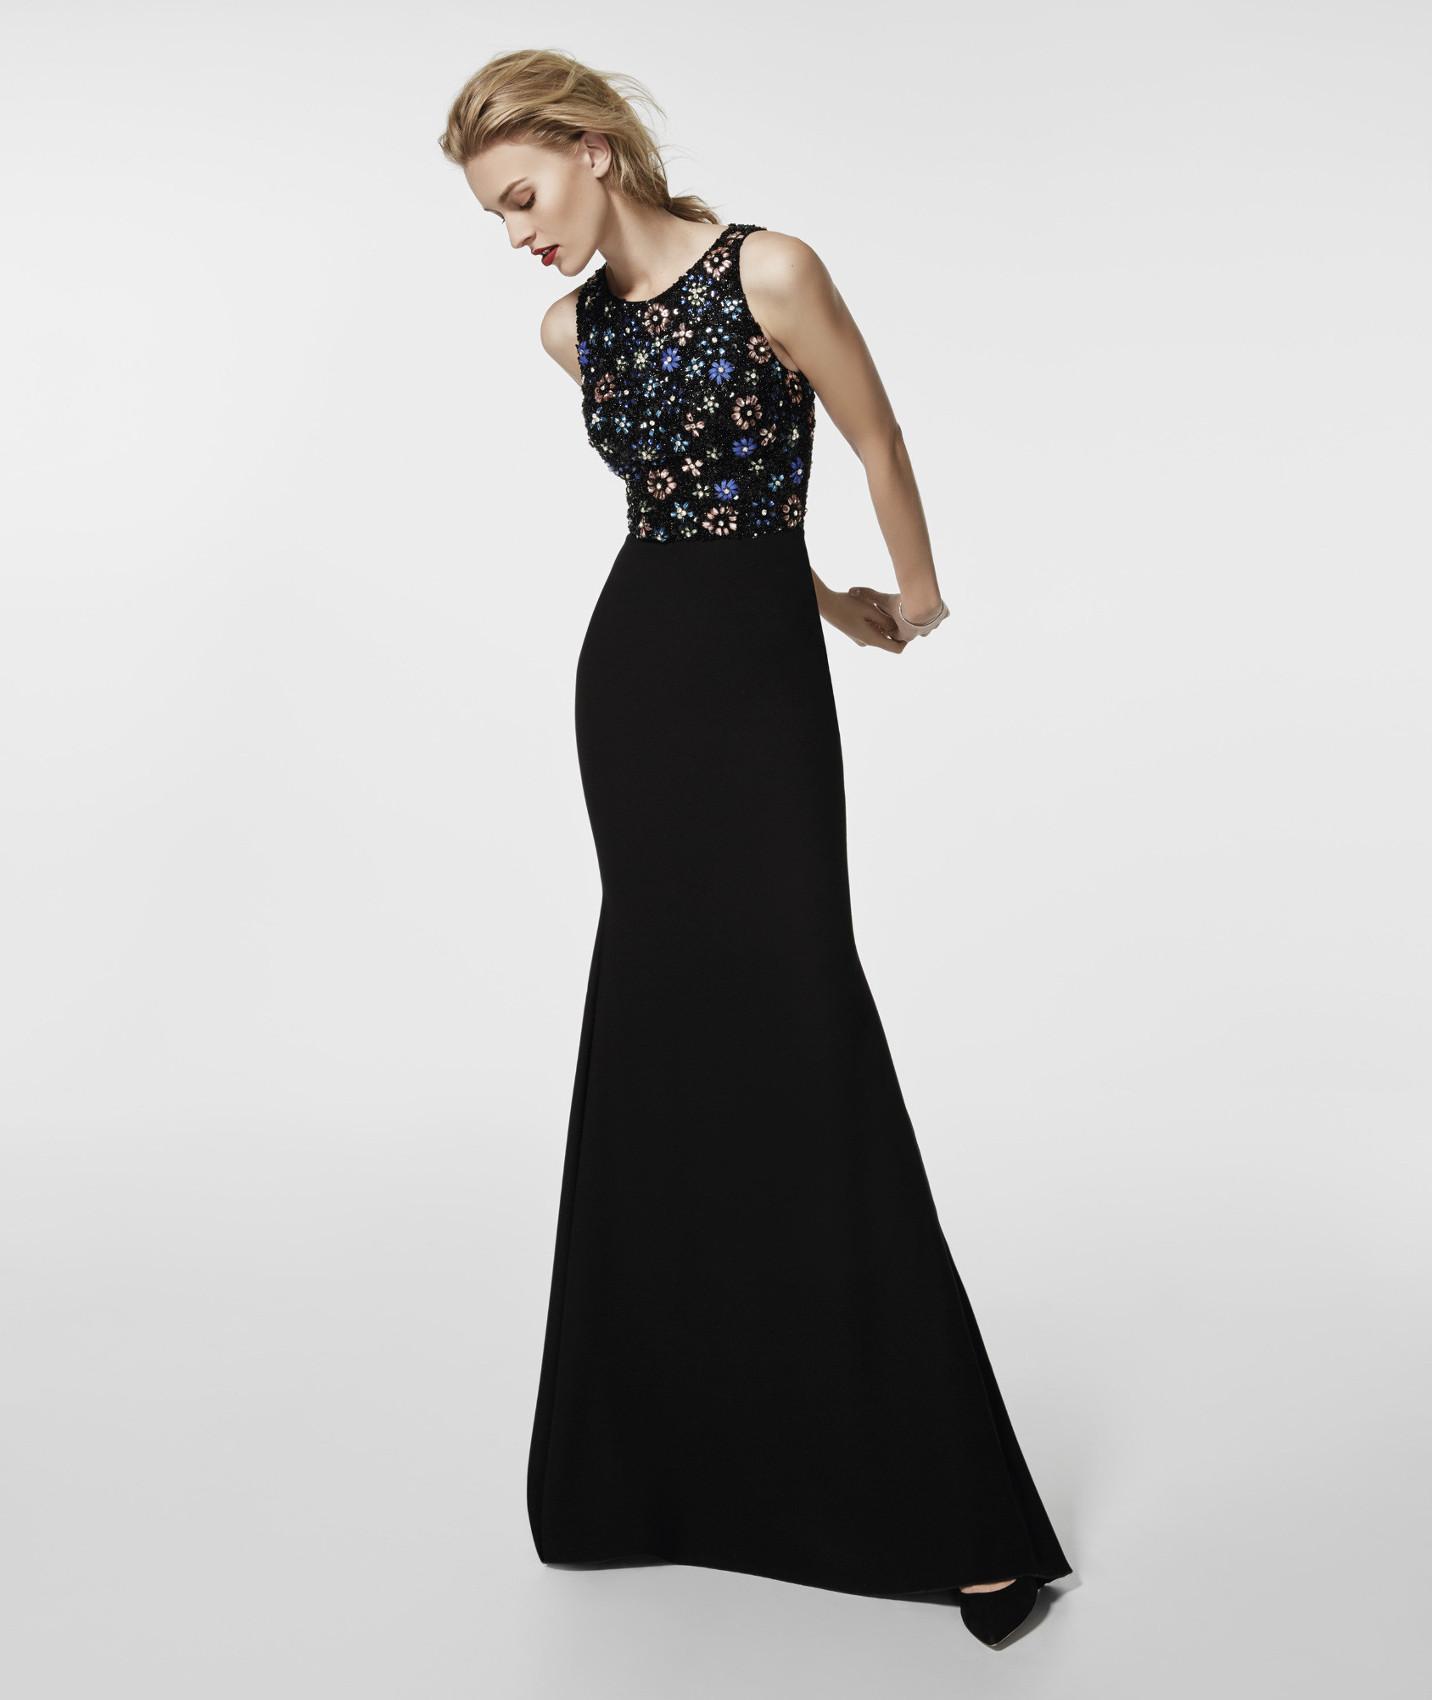 Gregaria evening dress